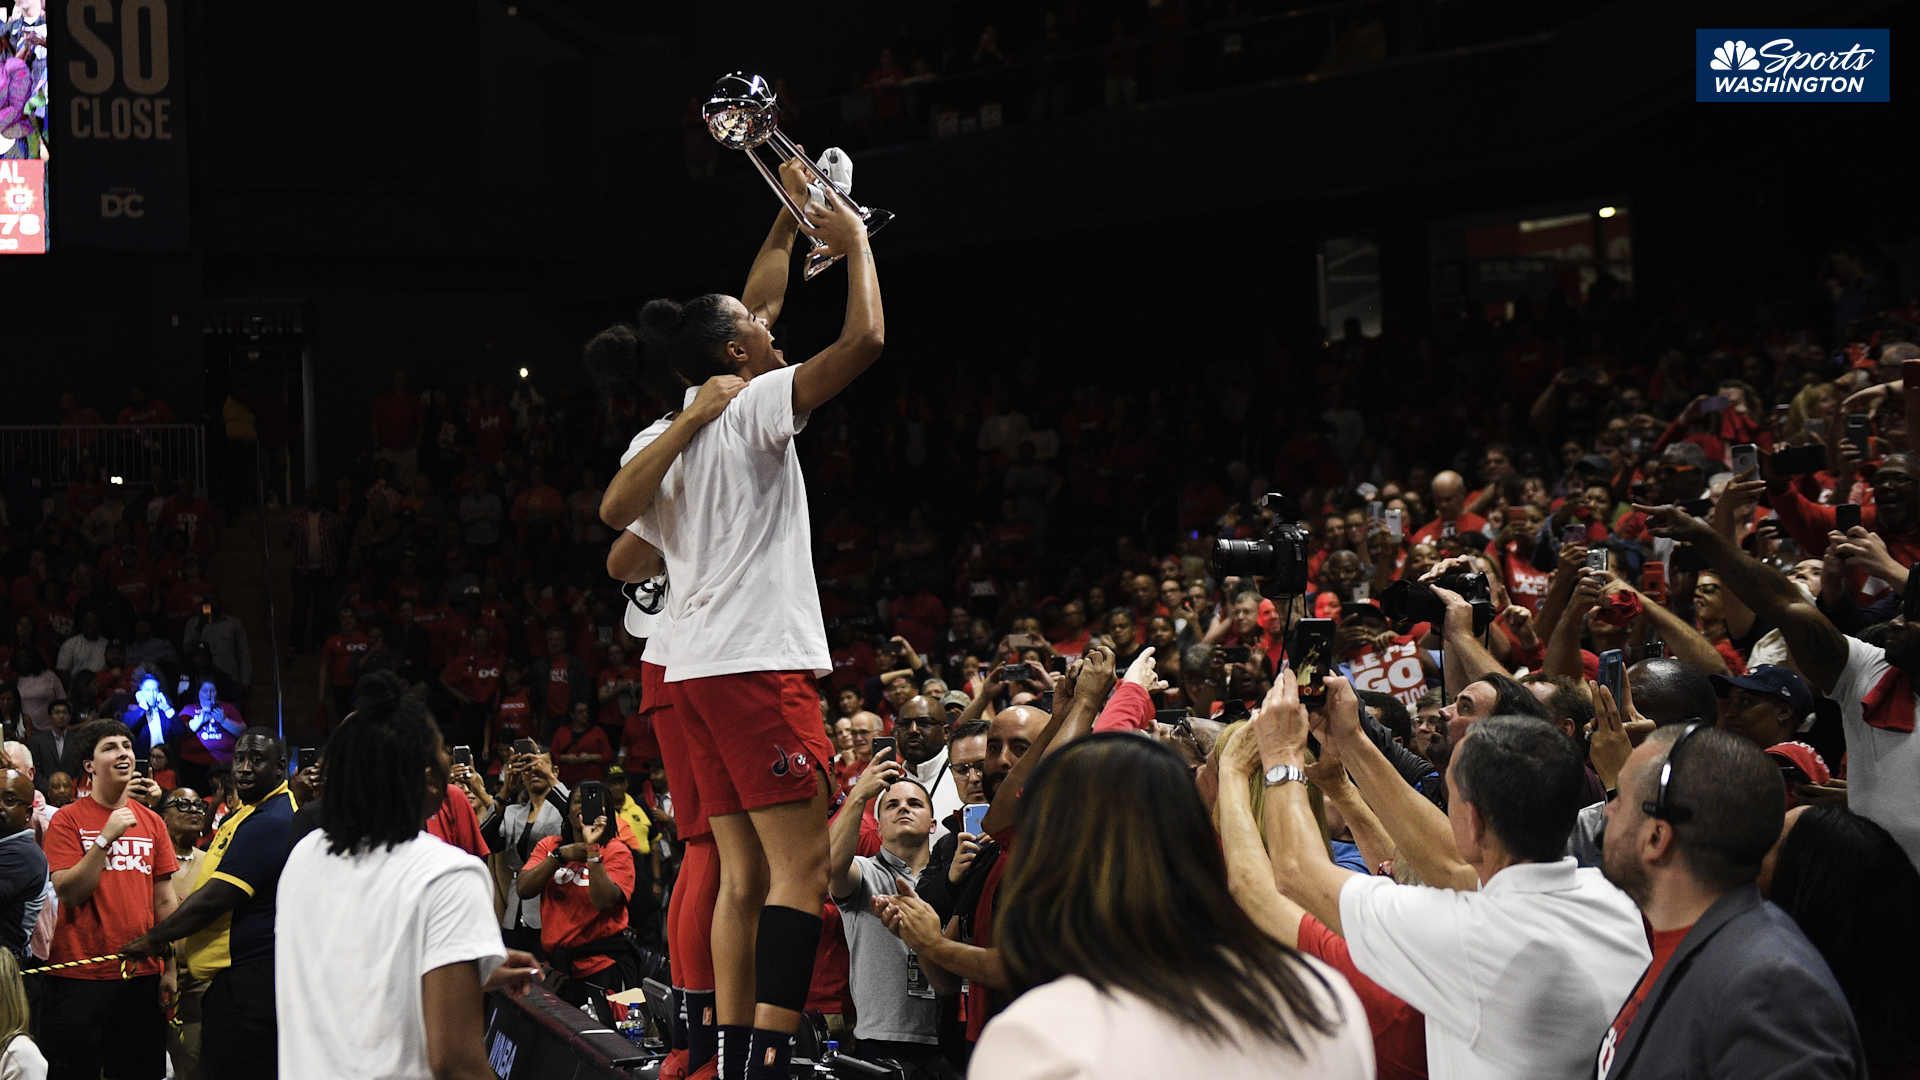 District of Champions: Washington Mystics win first WNBA title